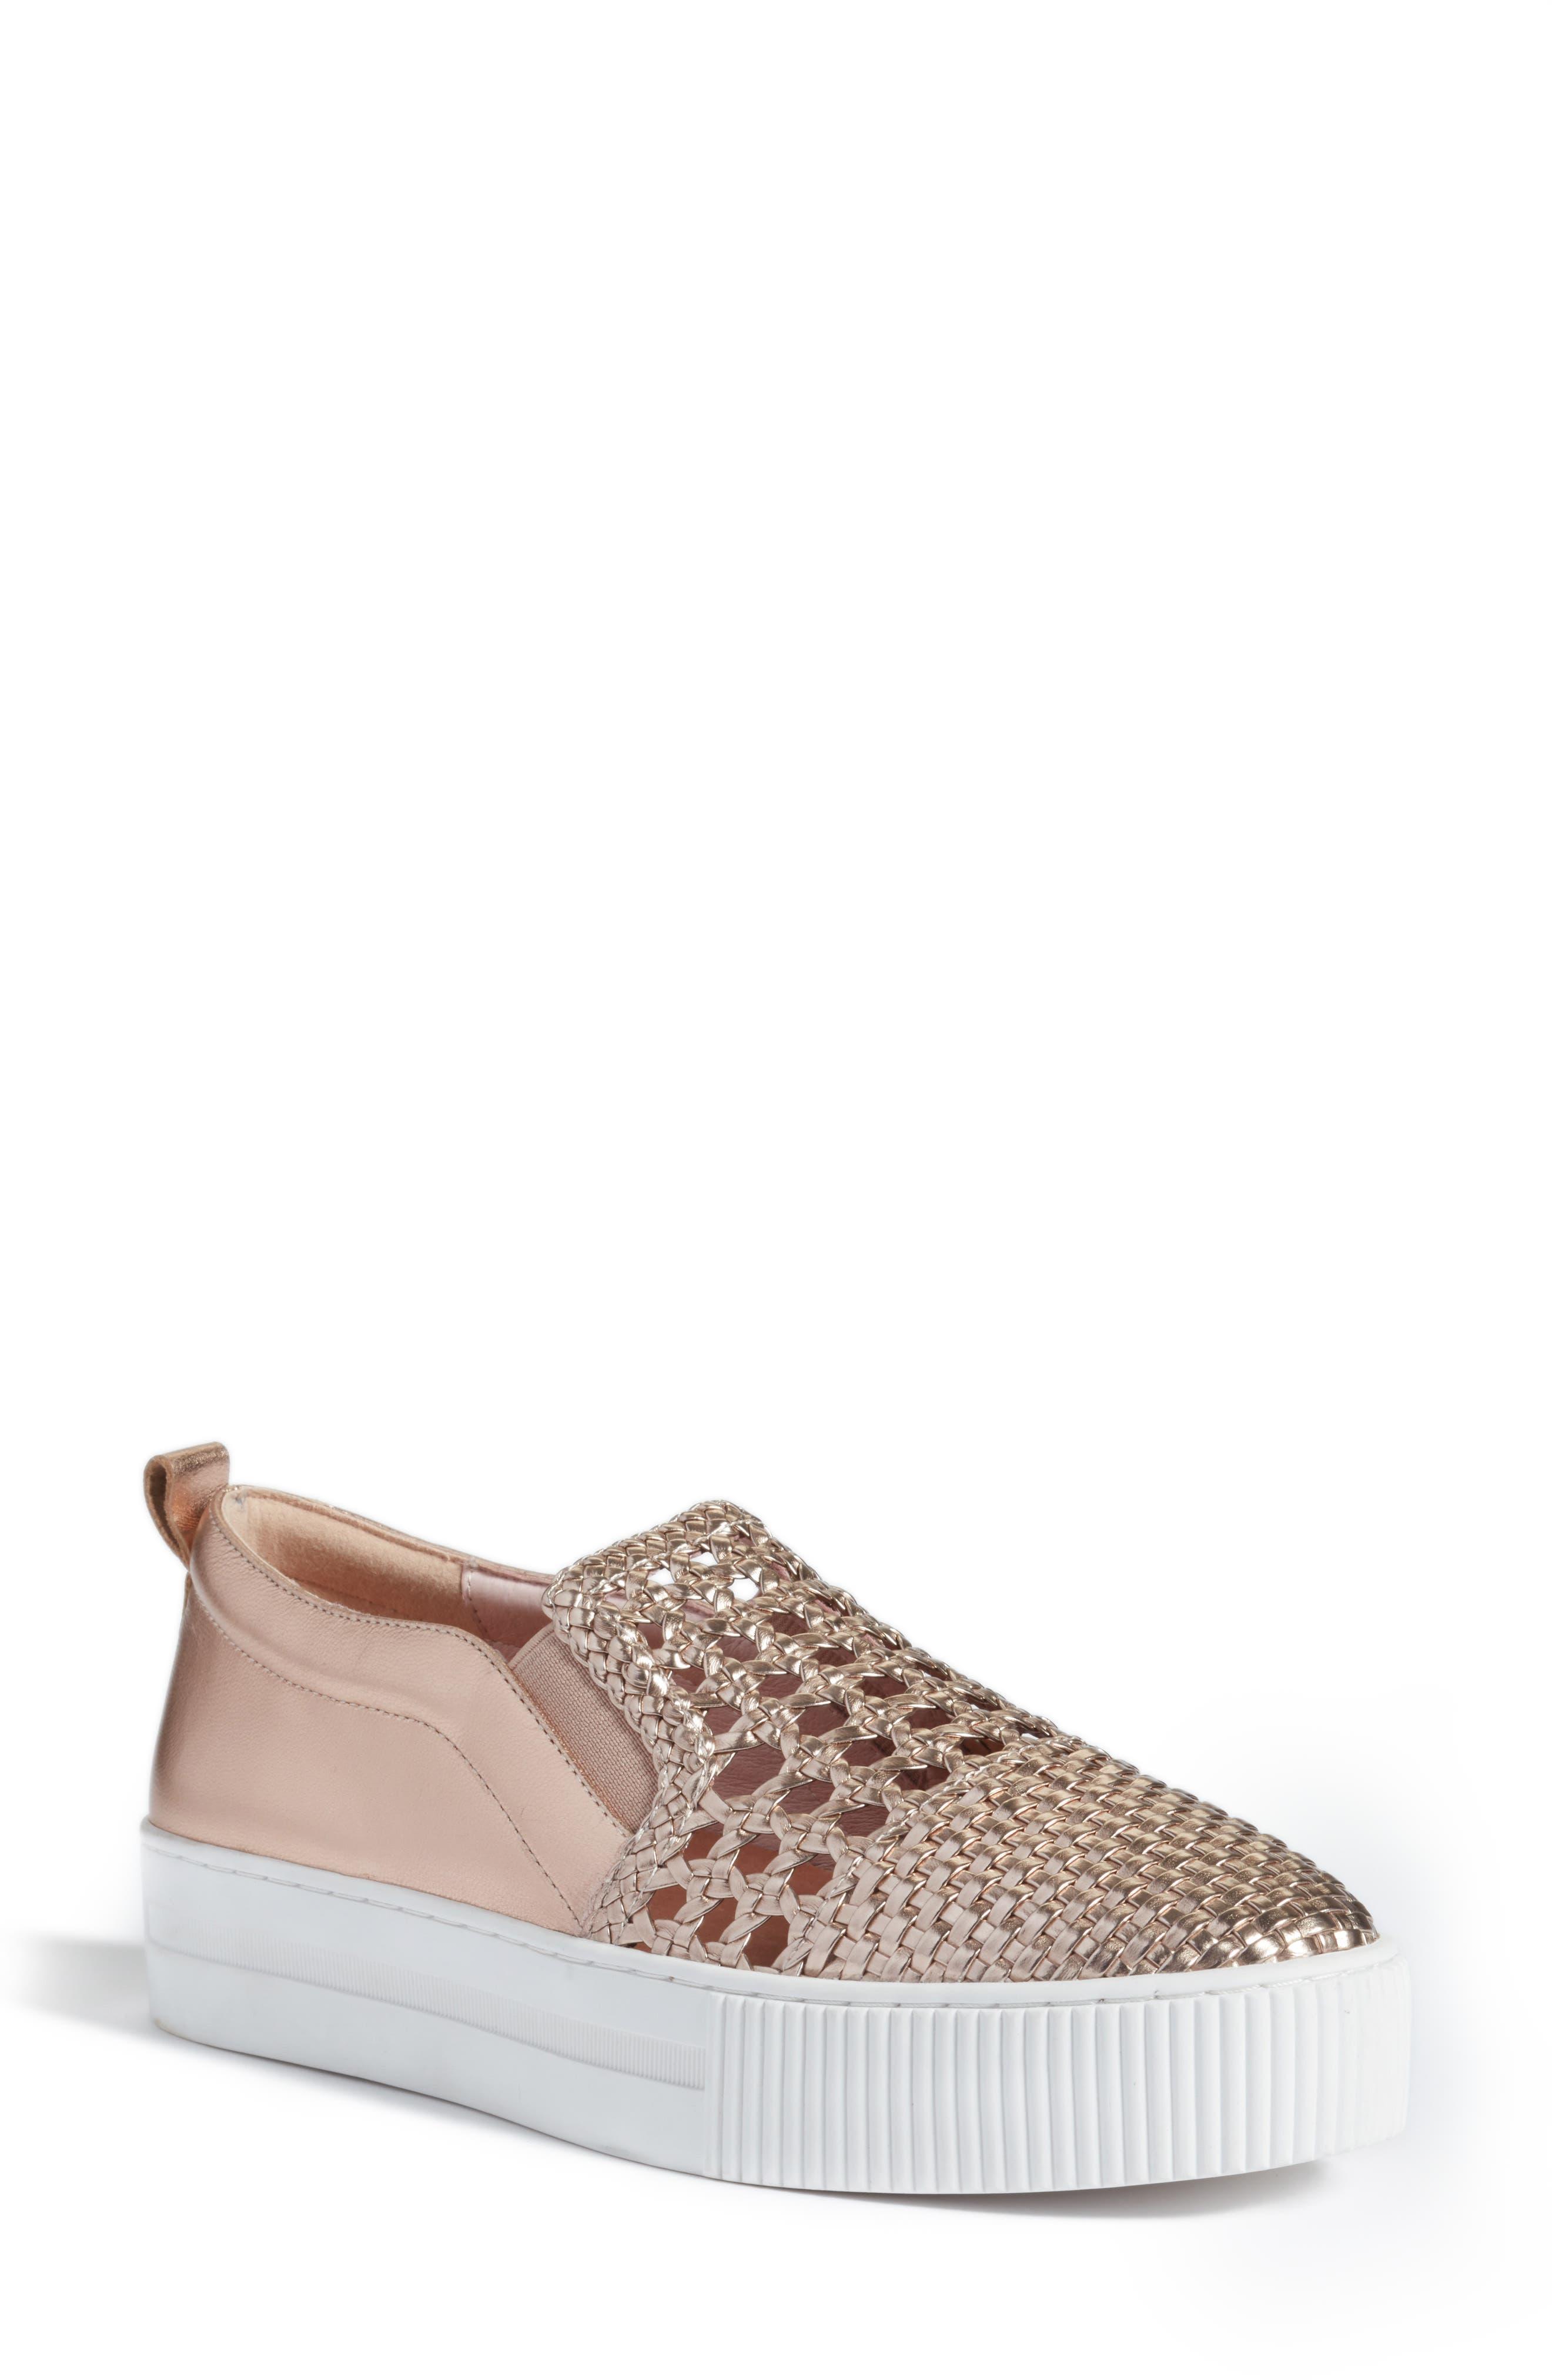 Baylee Slip-On Sneaker,                         Main,                         color, 715